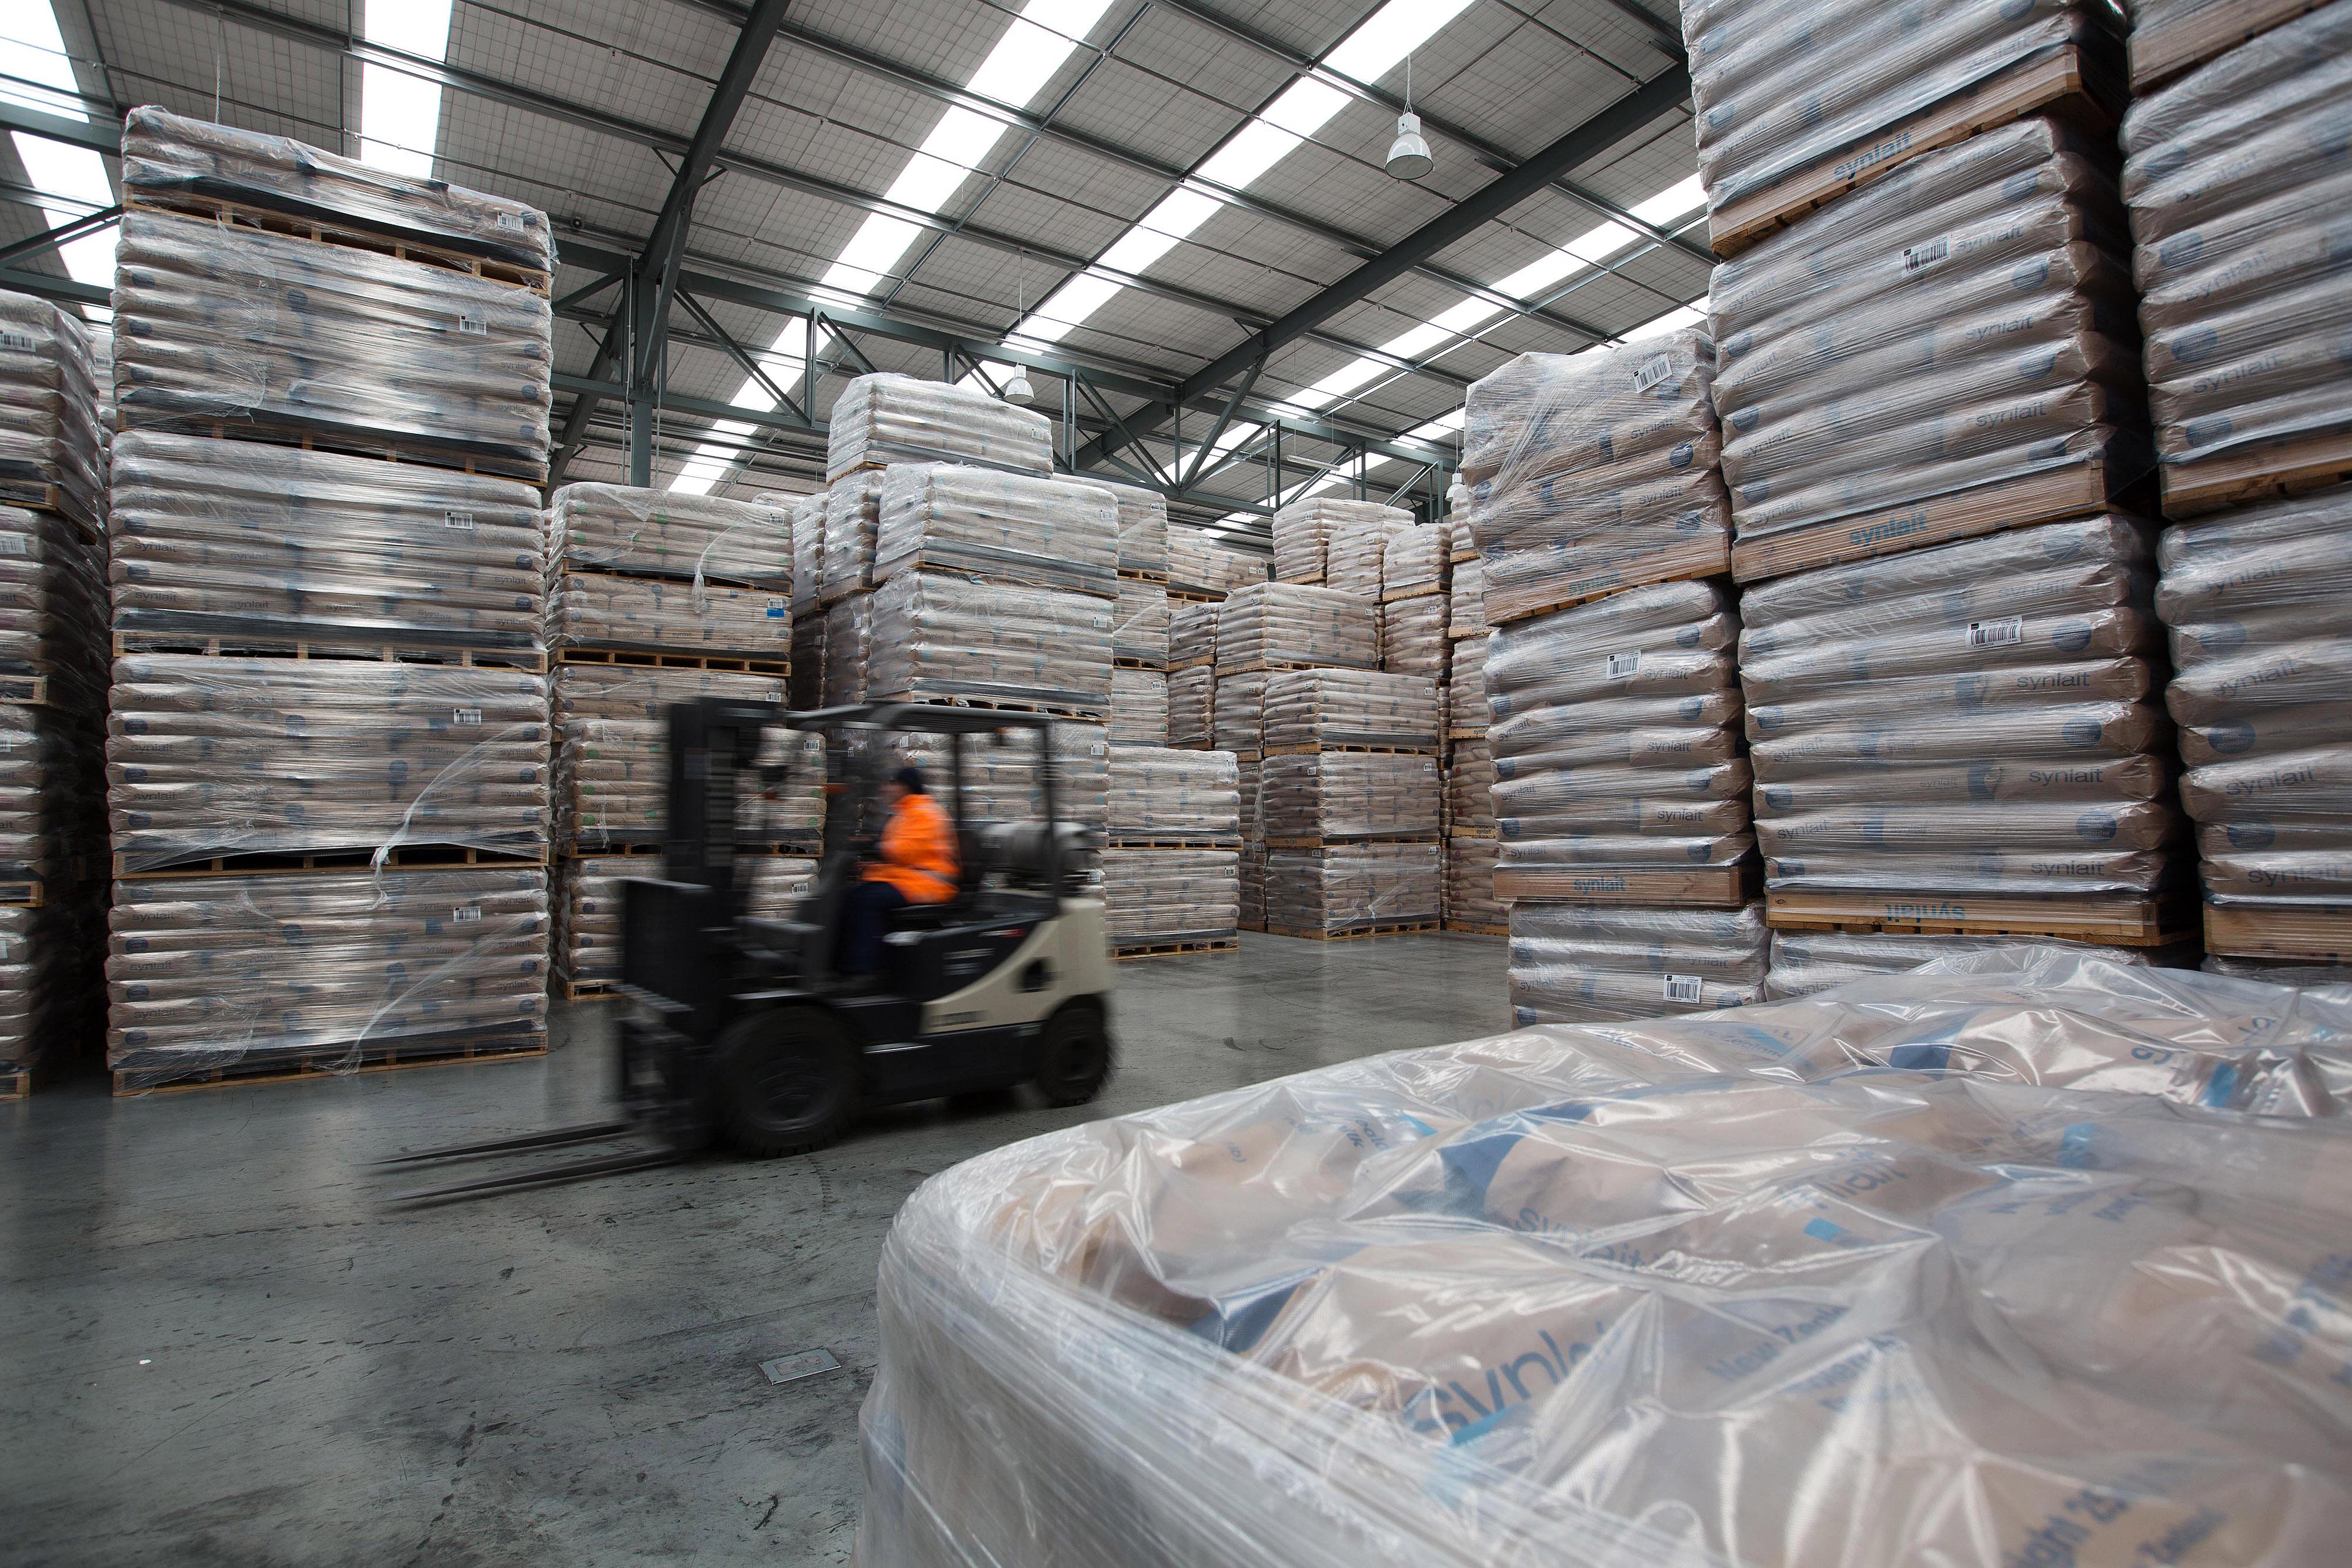 China Milk Demand Drop Has Morgan Stanley Bearish On Kiwi